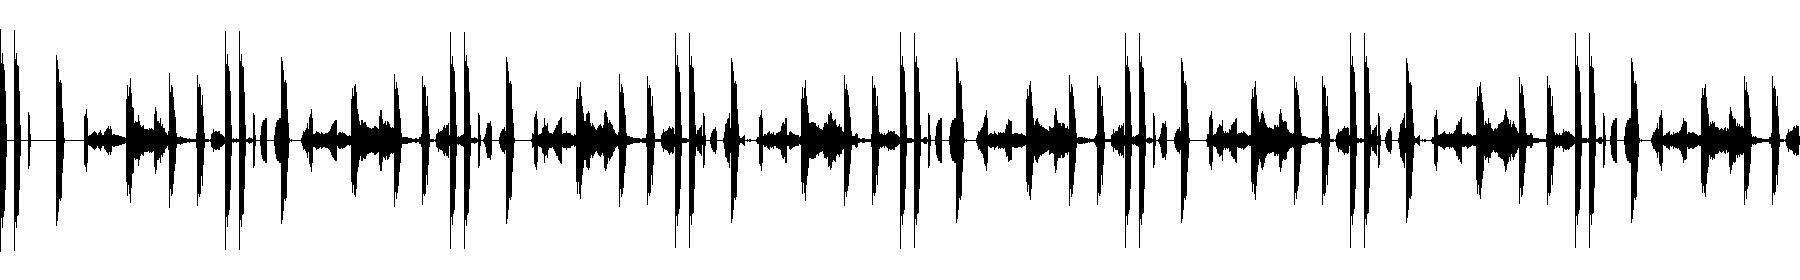 dts chordlp 29 fm